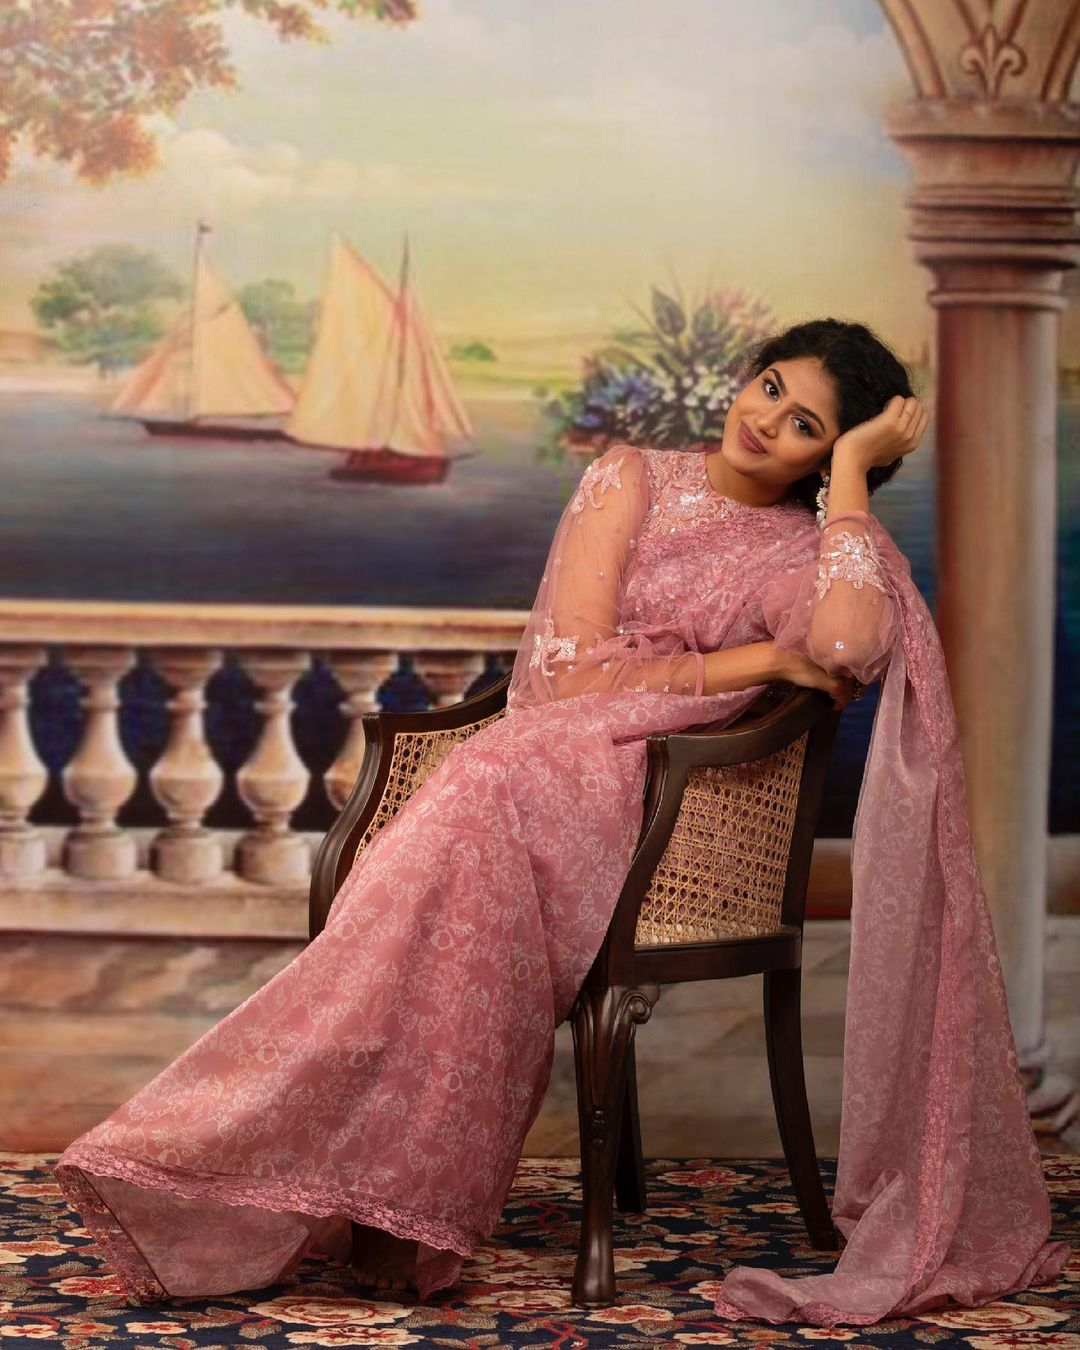 Faria Abdullah in Rococo print organza saree. 2021-05-10